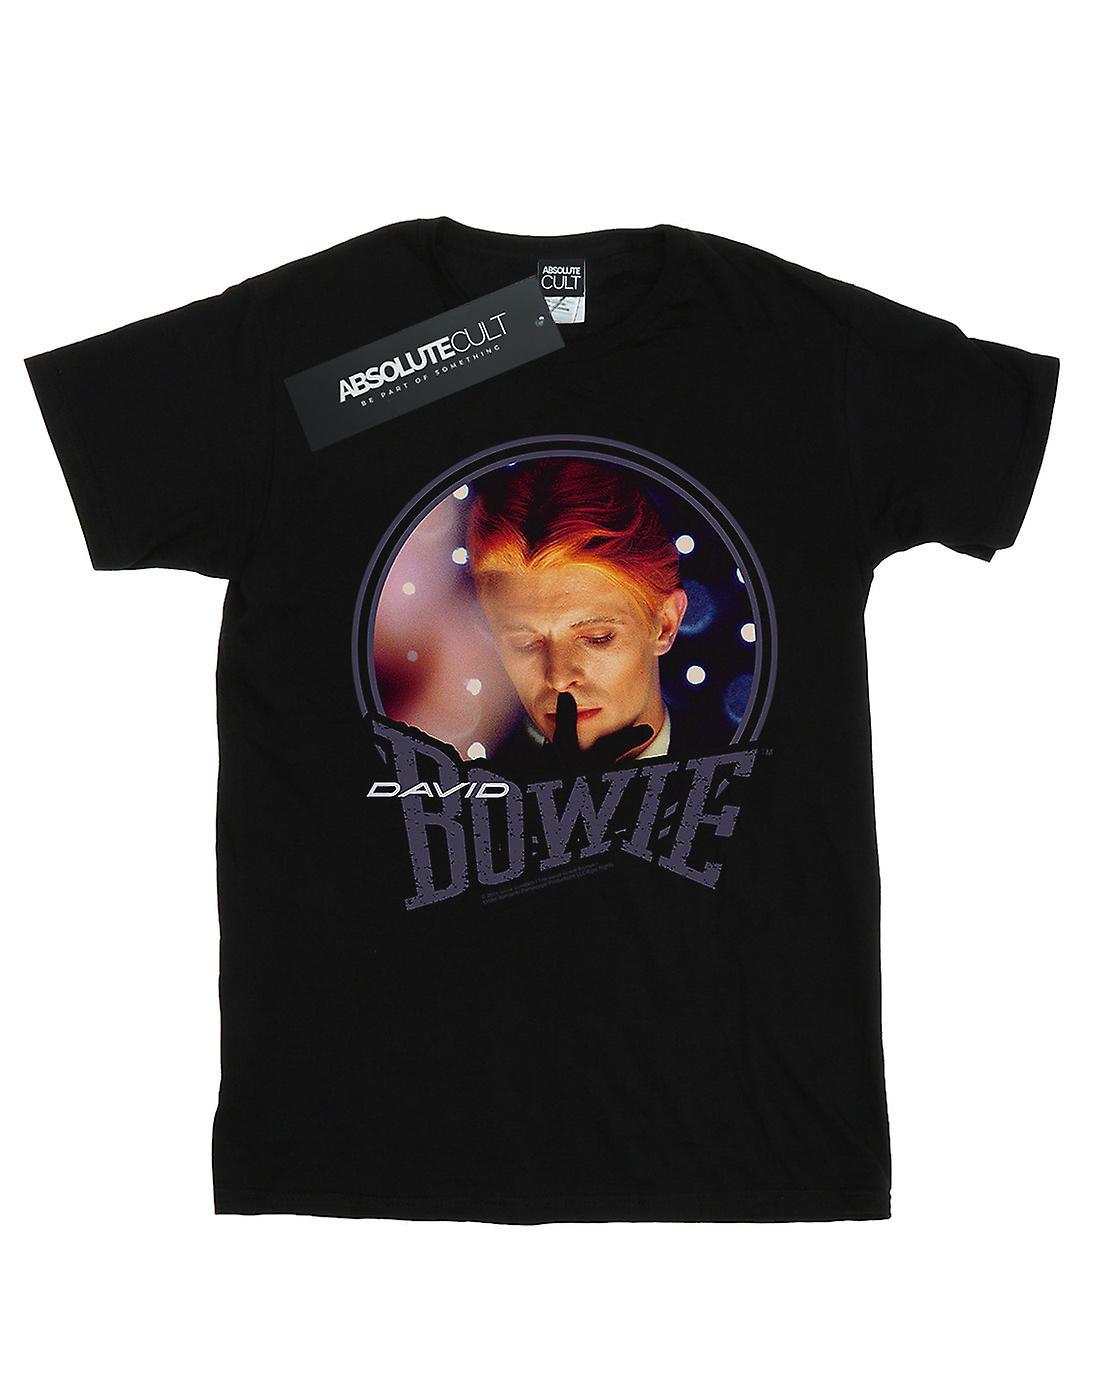 David Bowie Boys Quiet Lights T-Shirt